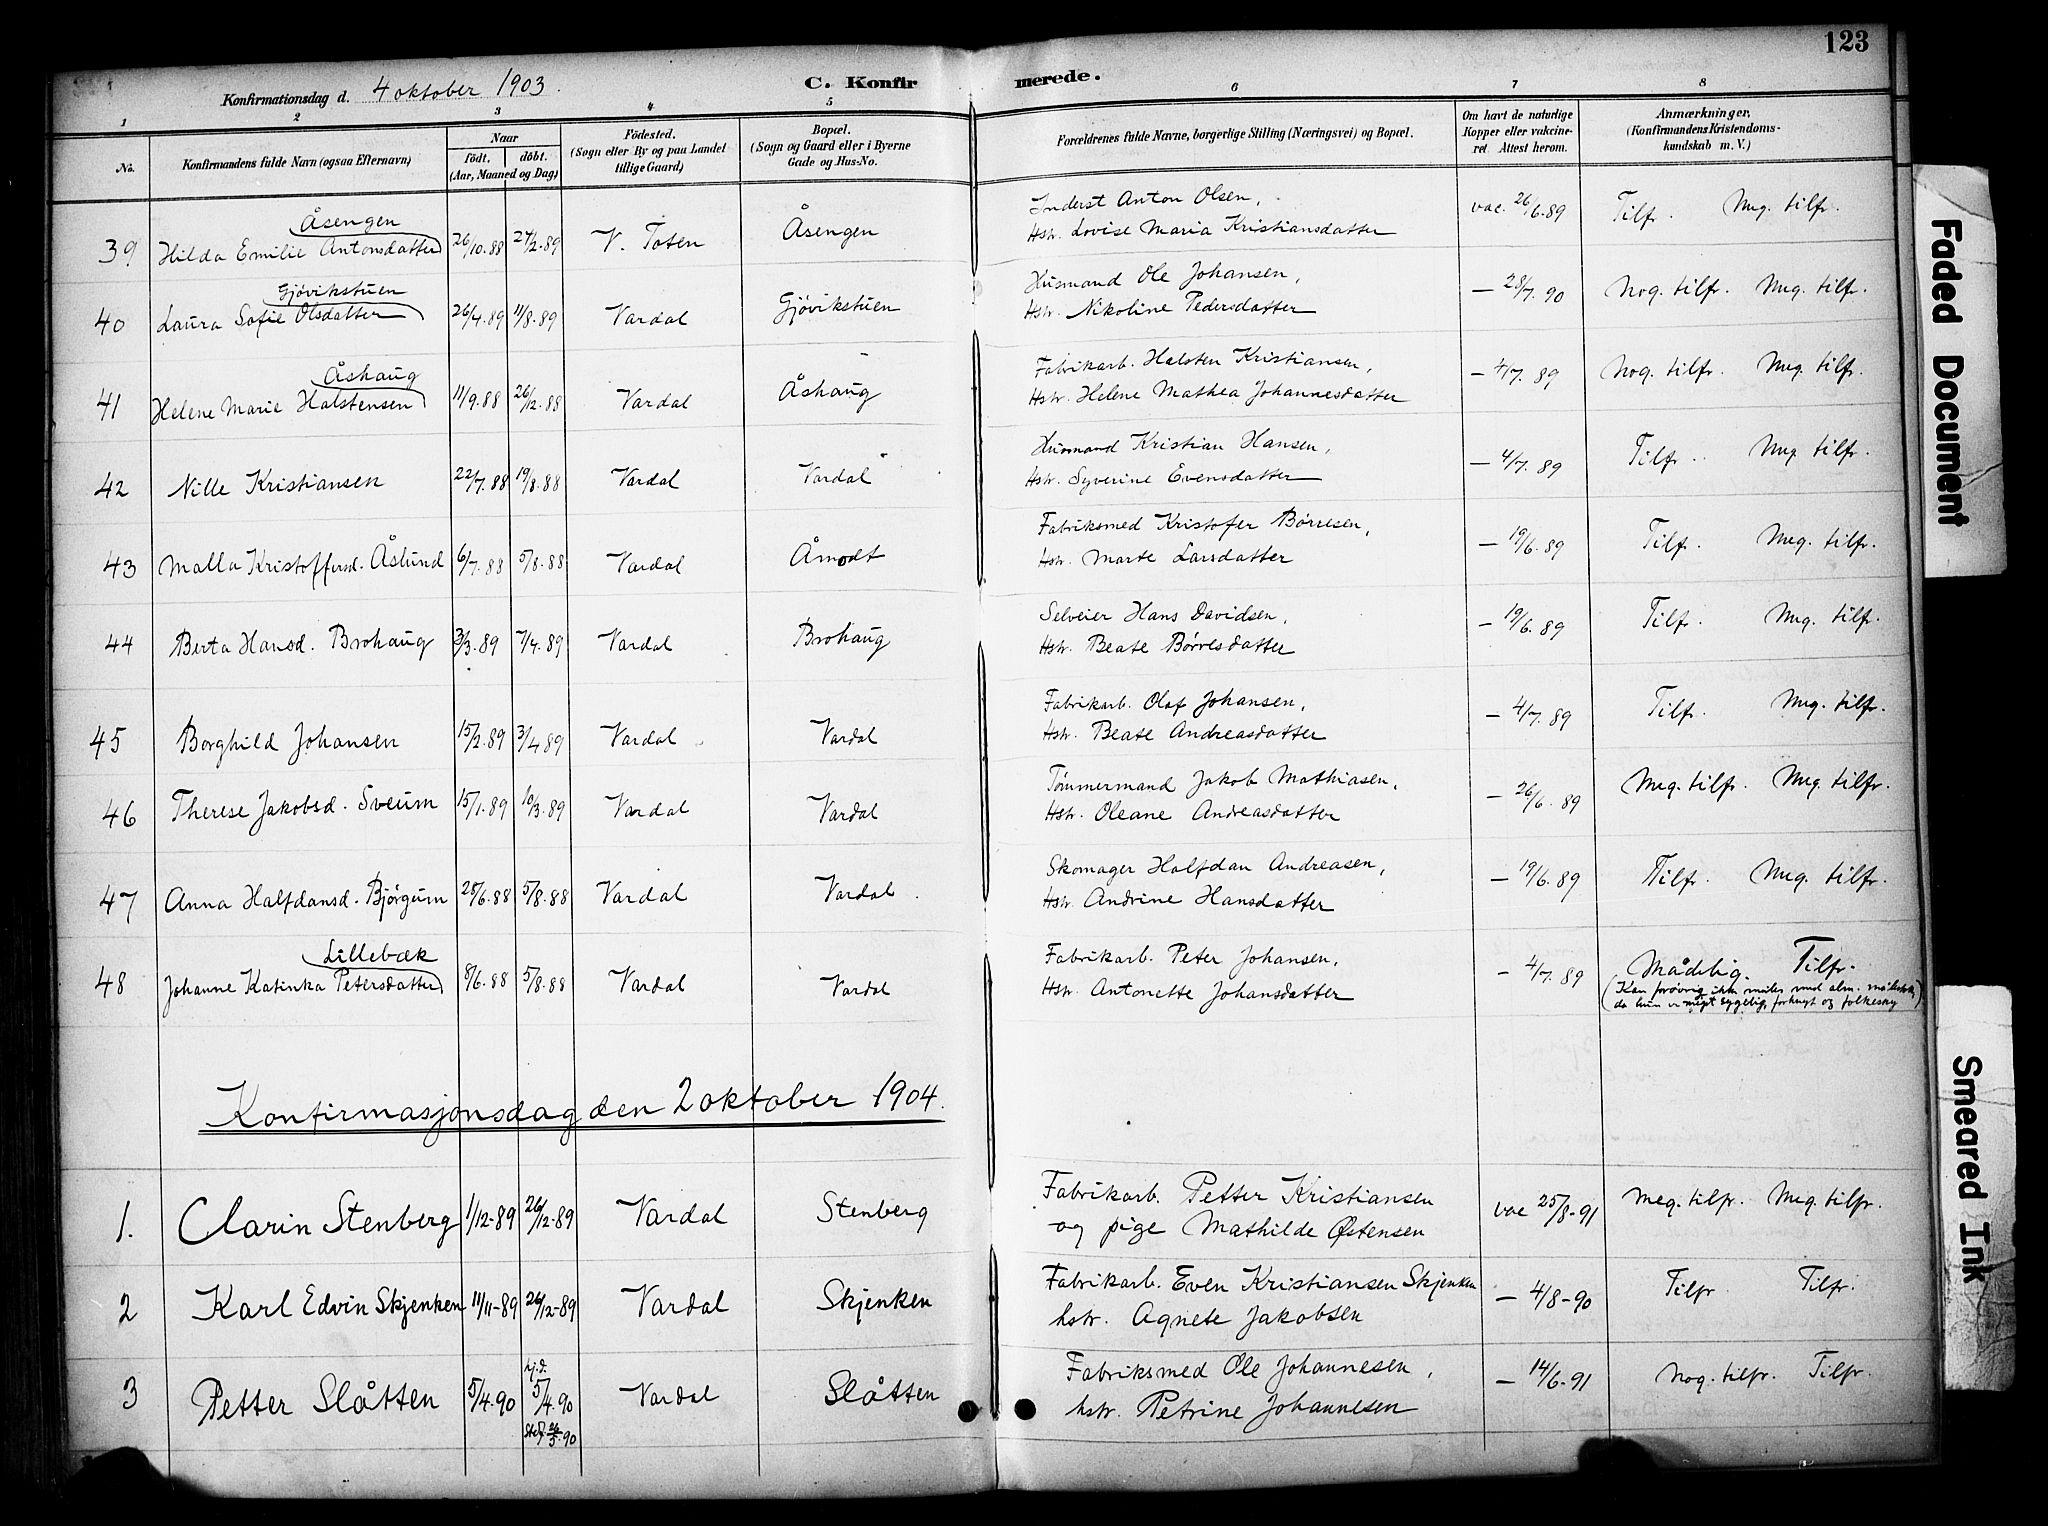 SAH, Vardal prestekontor, H/Ha/Haa/L0012: Ministerialbok nr. 12, 1893-1904, s. 123